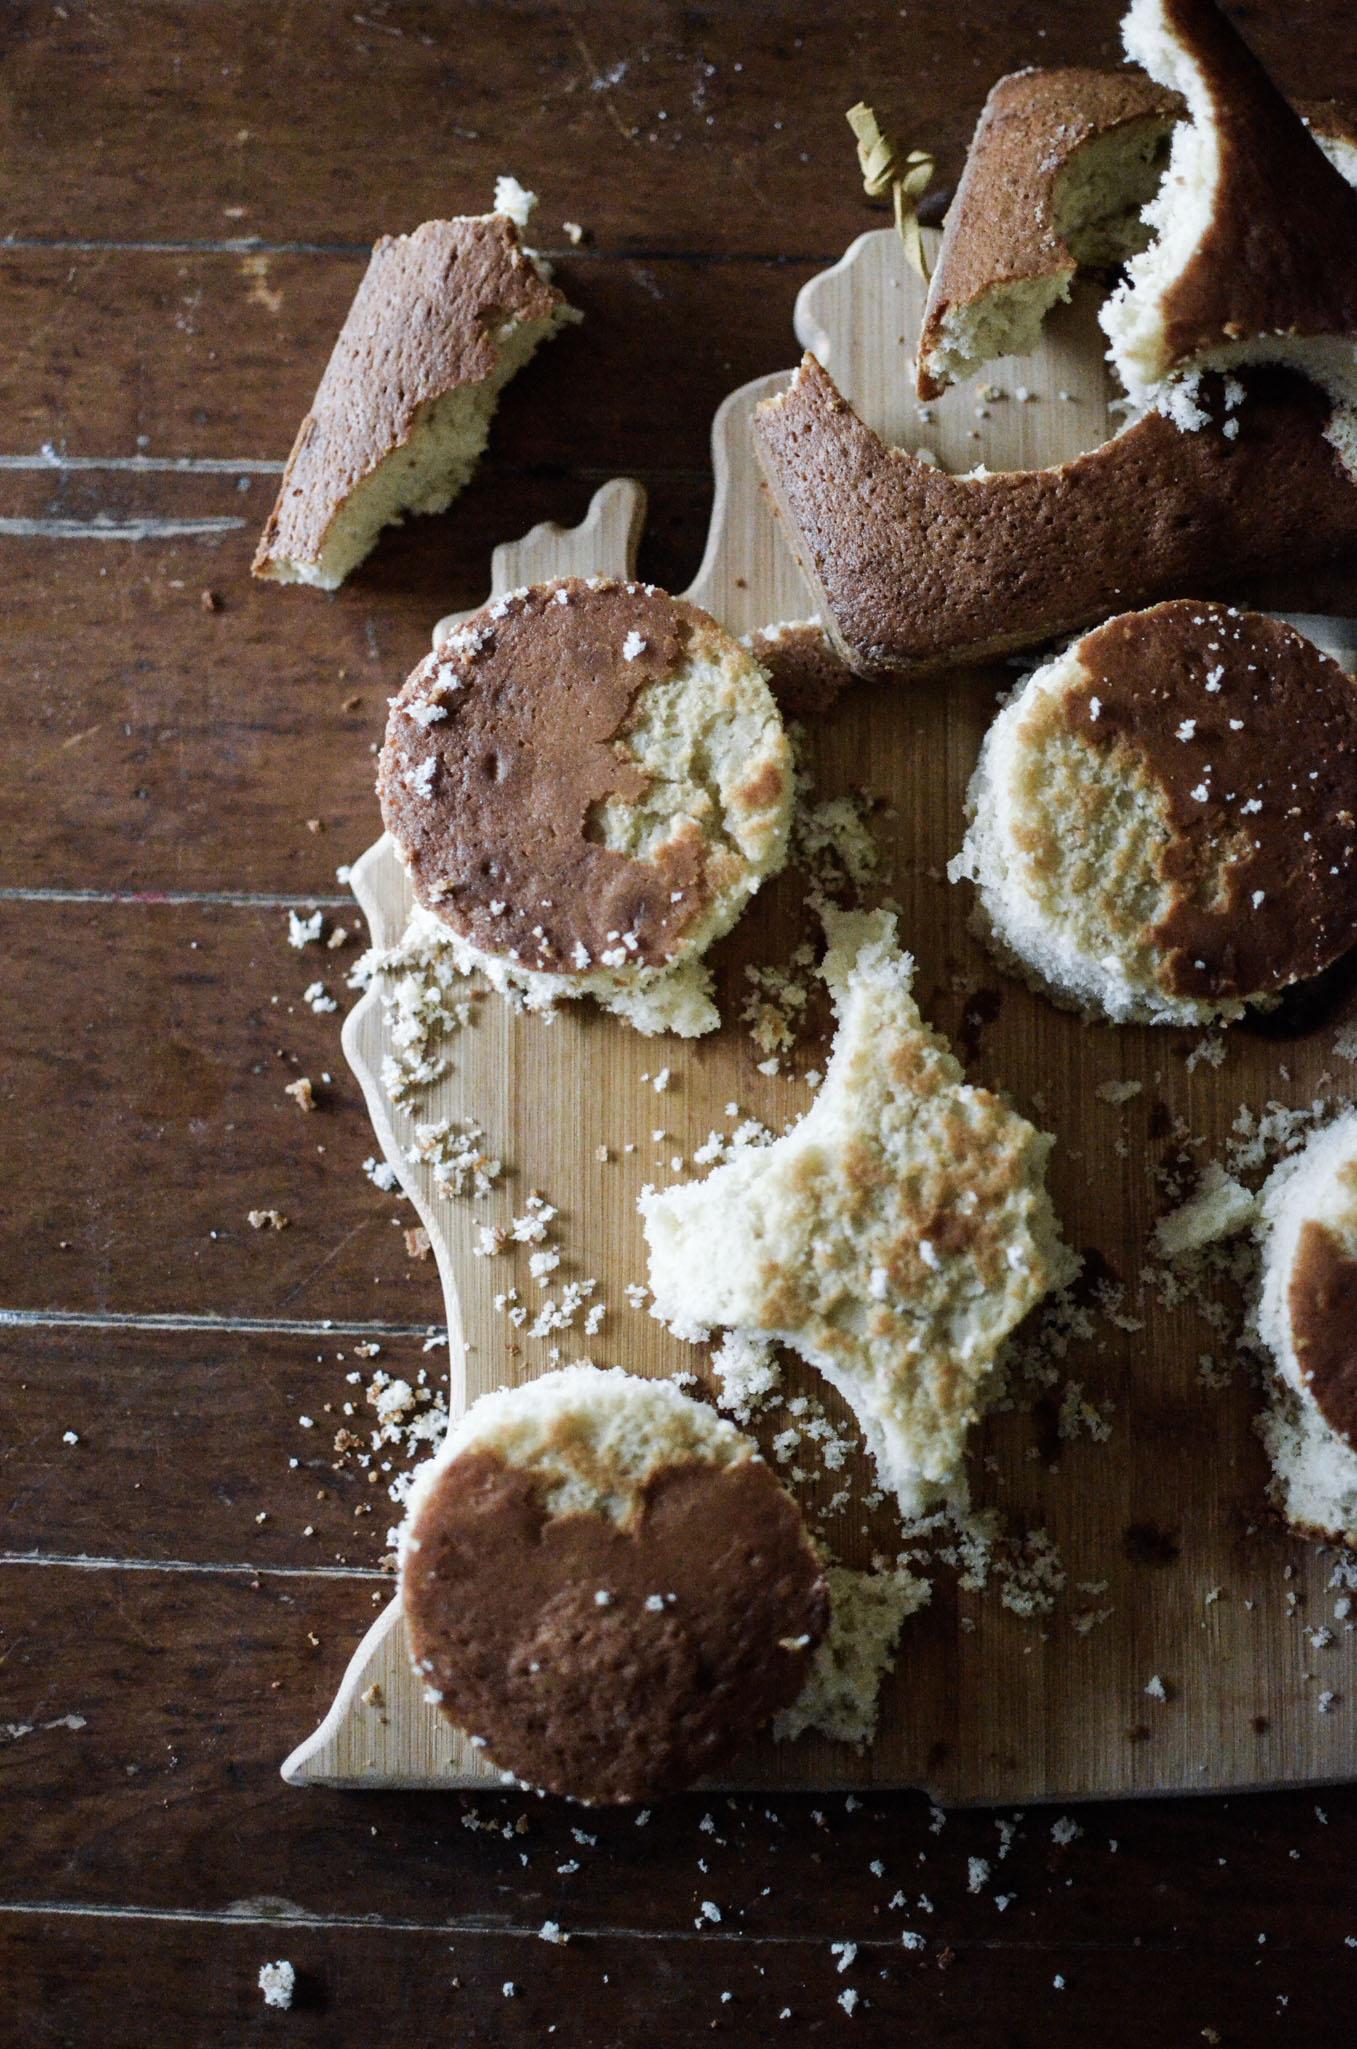 Wendling_Boyd_2_Years_Pudding_Cake-15.jpg